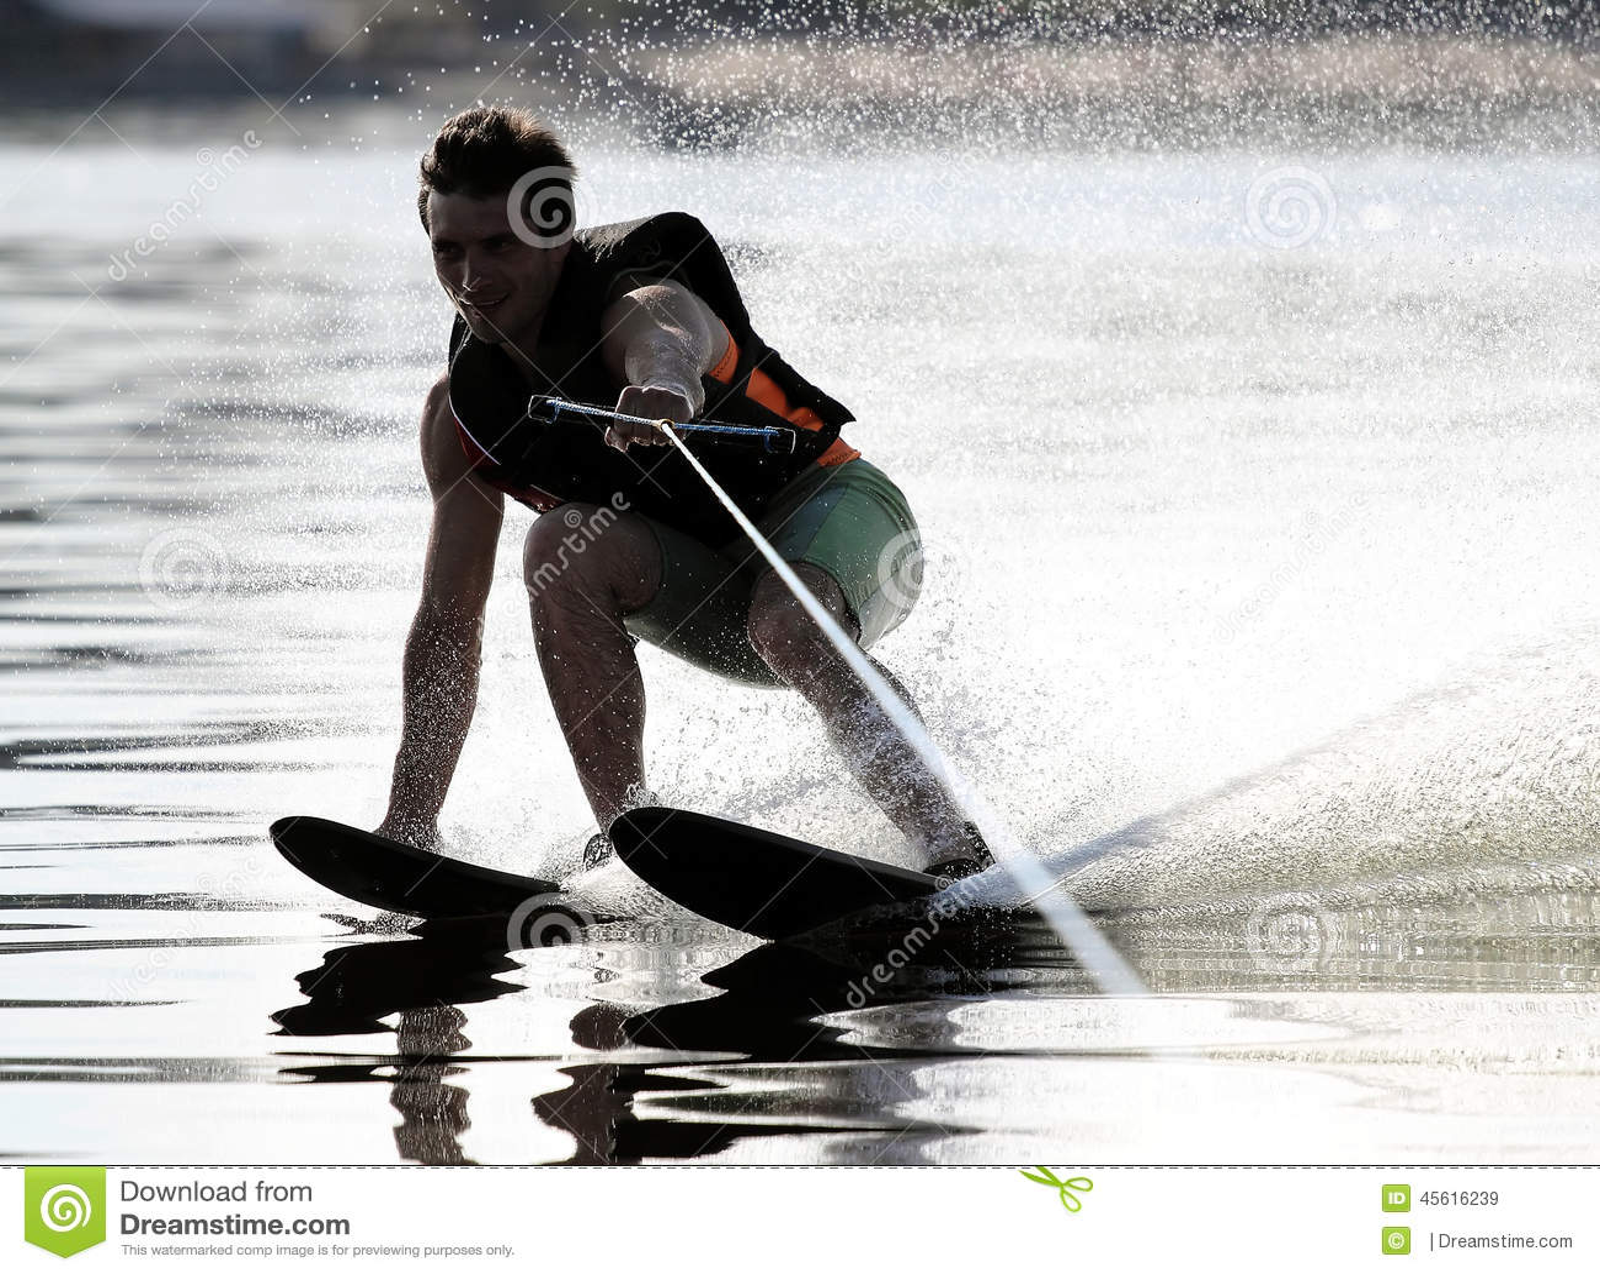 Atletenwaterskiën